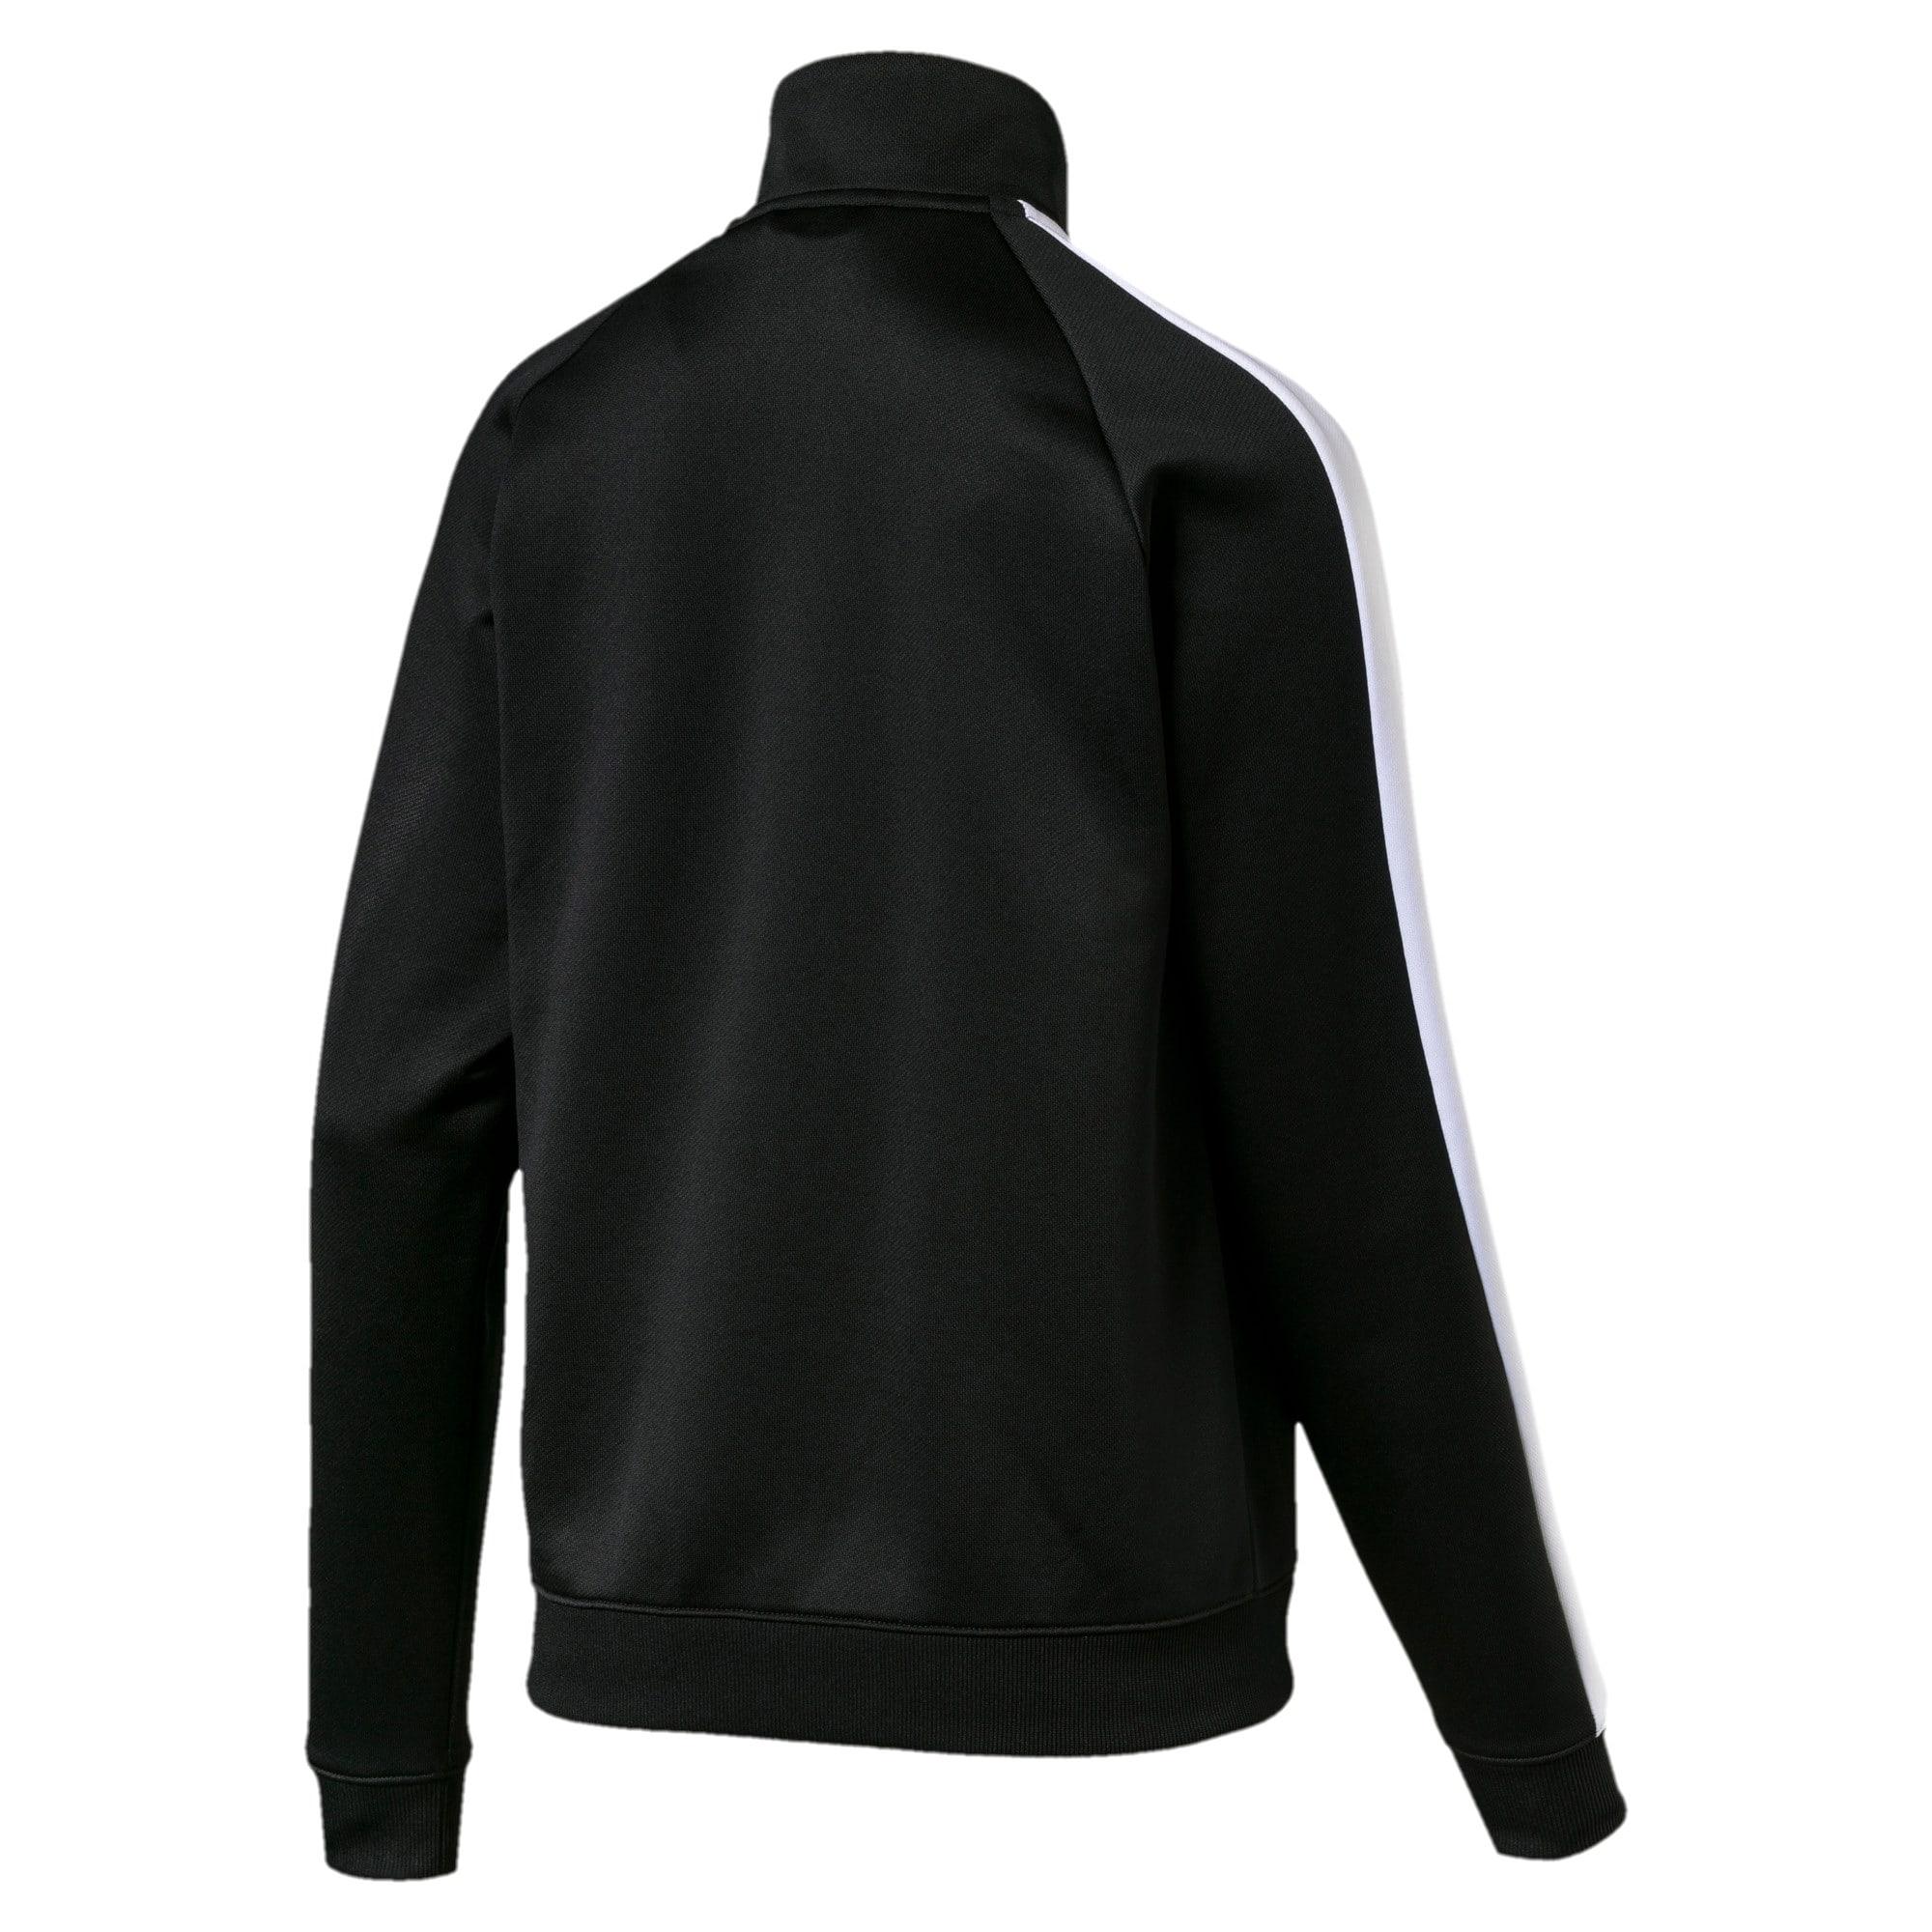 Thumbnail 2 of Classics Women's T7 Track Jacket, Puma Black, medium